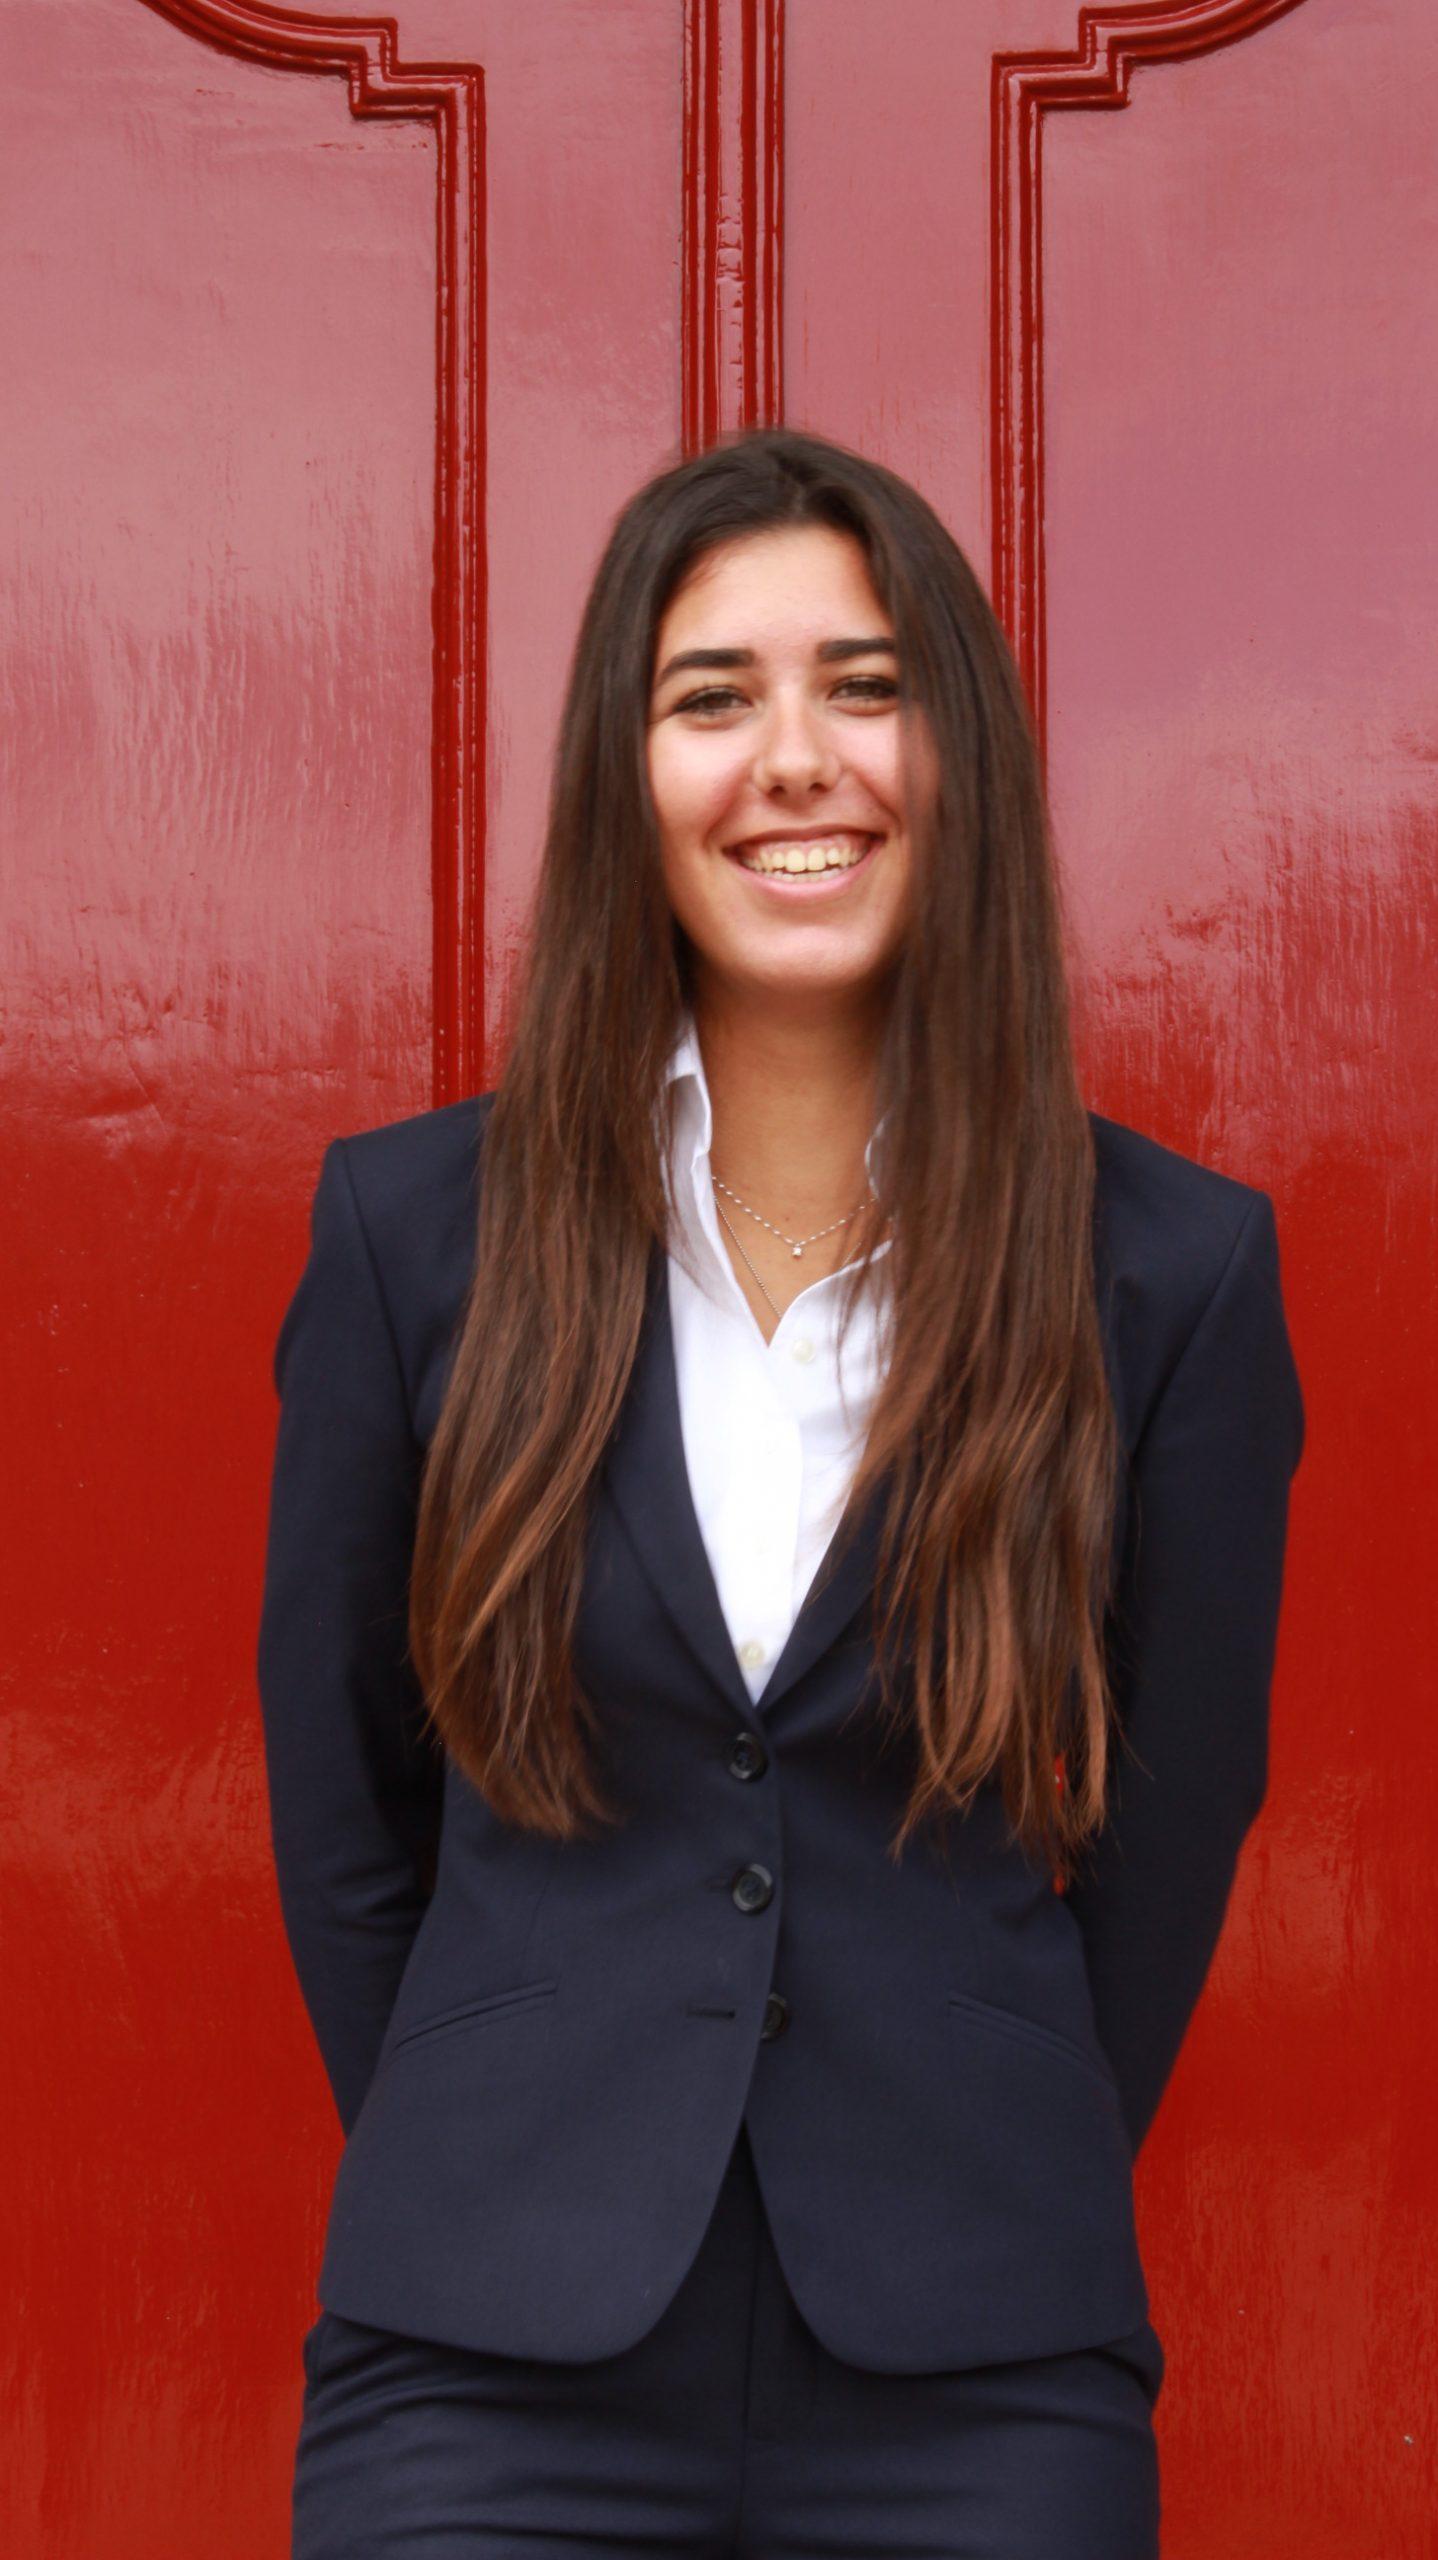 Silvia Santarsiero - Secretary/Coordinator of Internal Affairs